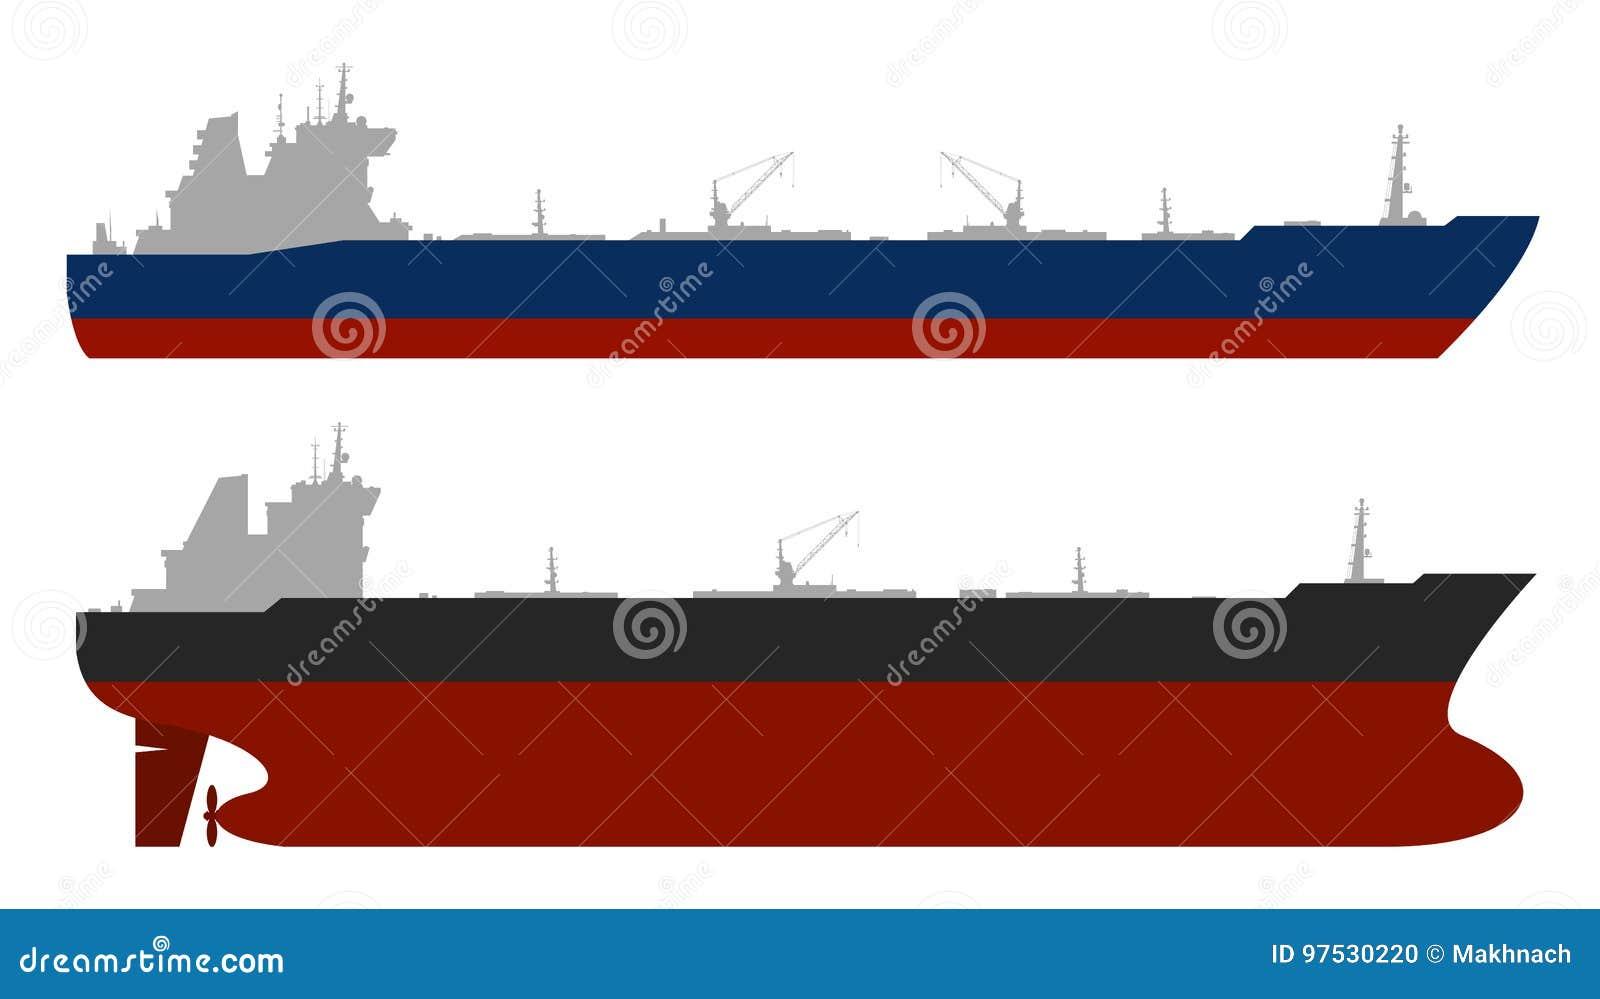 Oil tankerss set. Vector